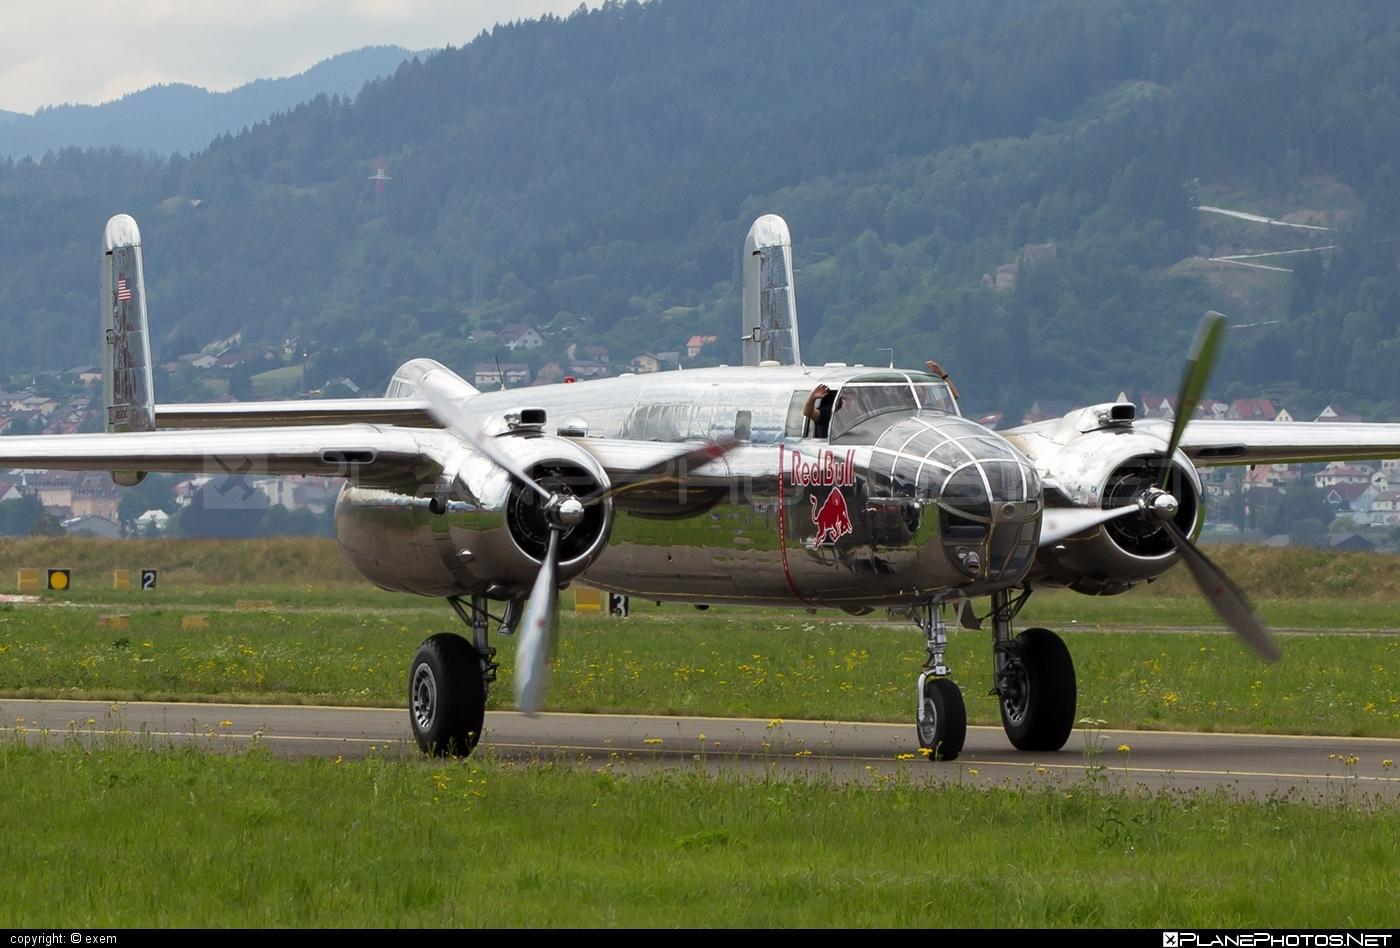 North American B-25J Mitchell - N6123C operated by The Flying Bulls #airpower #airpower2013 #b25 #b25j #b25mitchell #northamerican #theflyingbulls